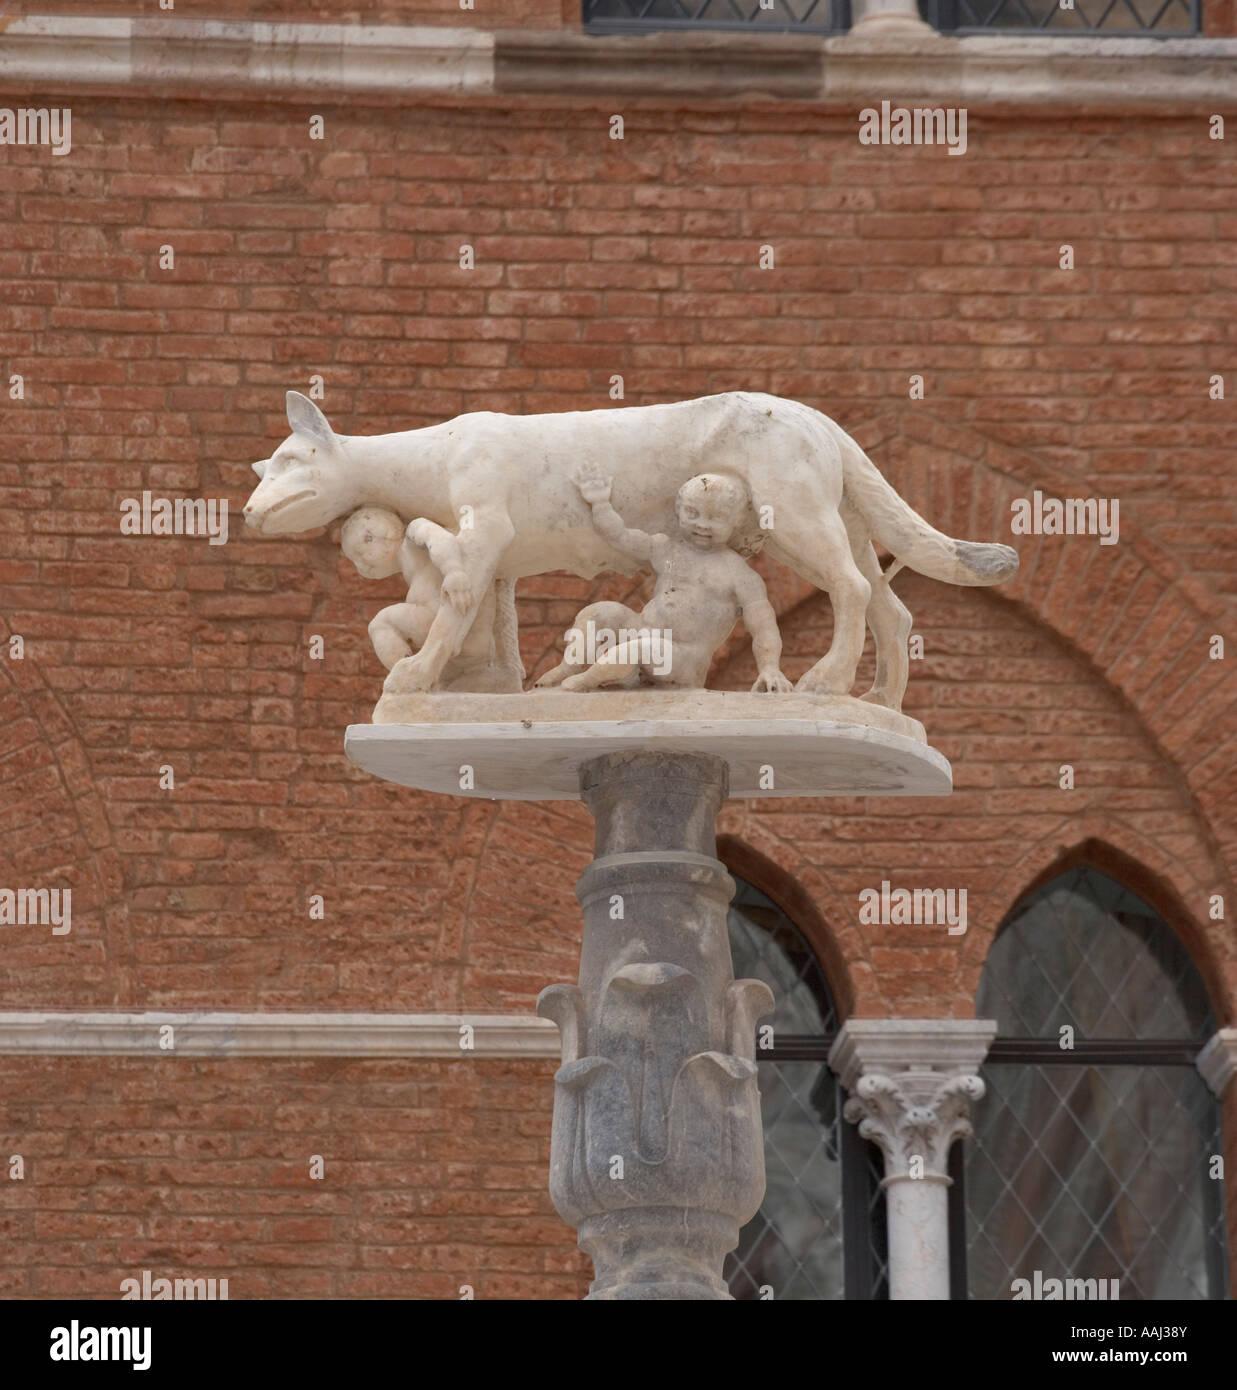 Italy Europe European Union Italian Member Western Southern South Tuscan Tuscany Sienna - Stock Image